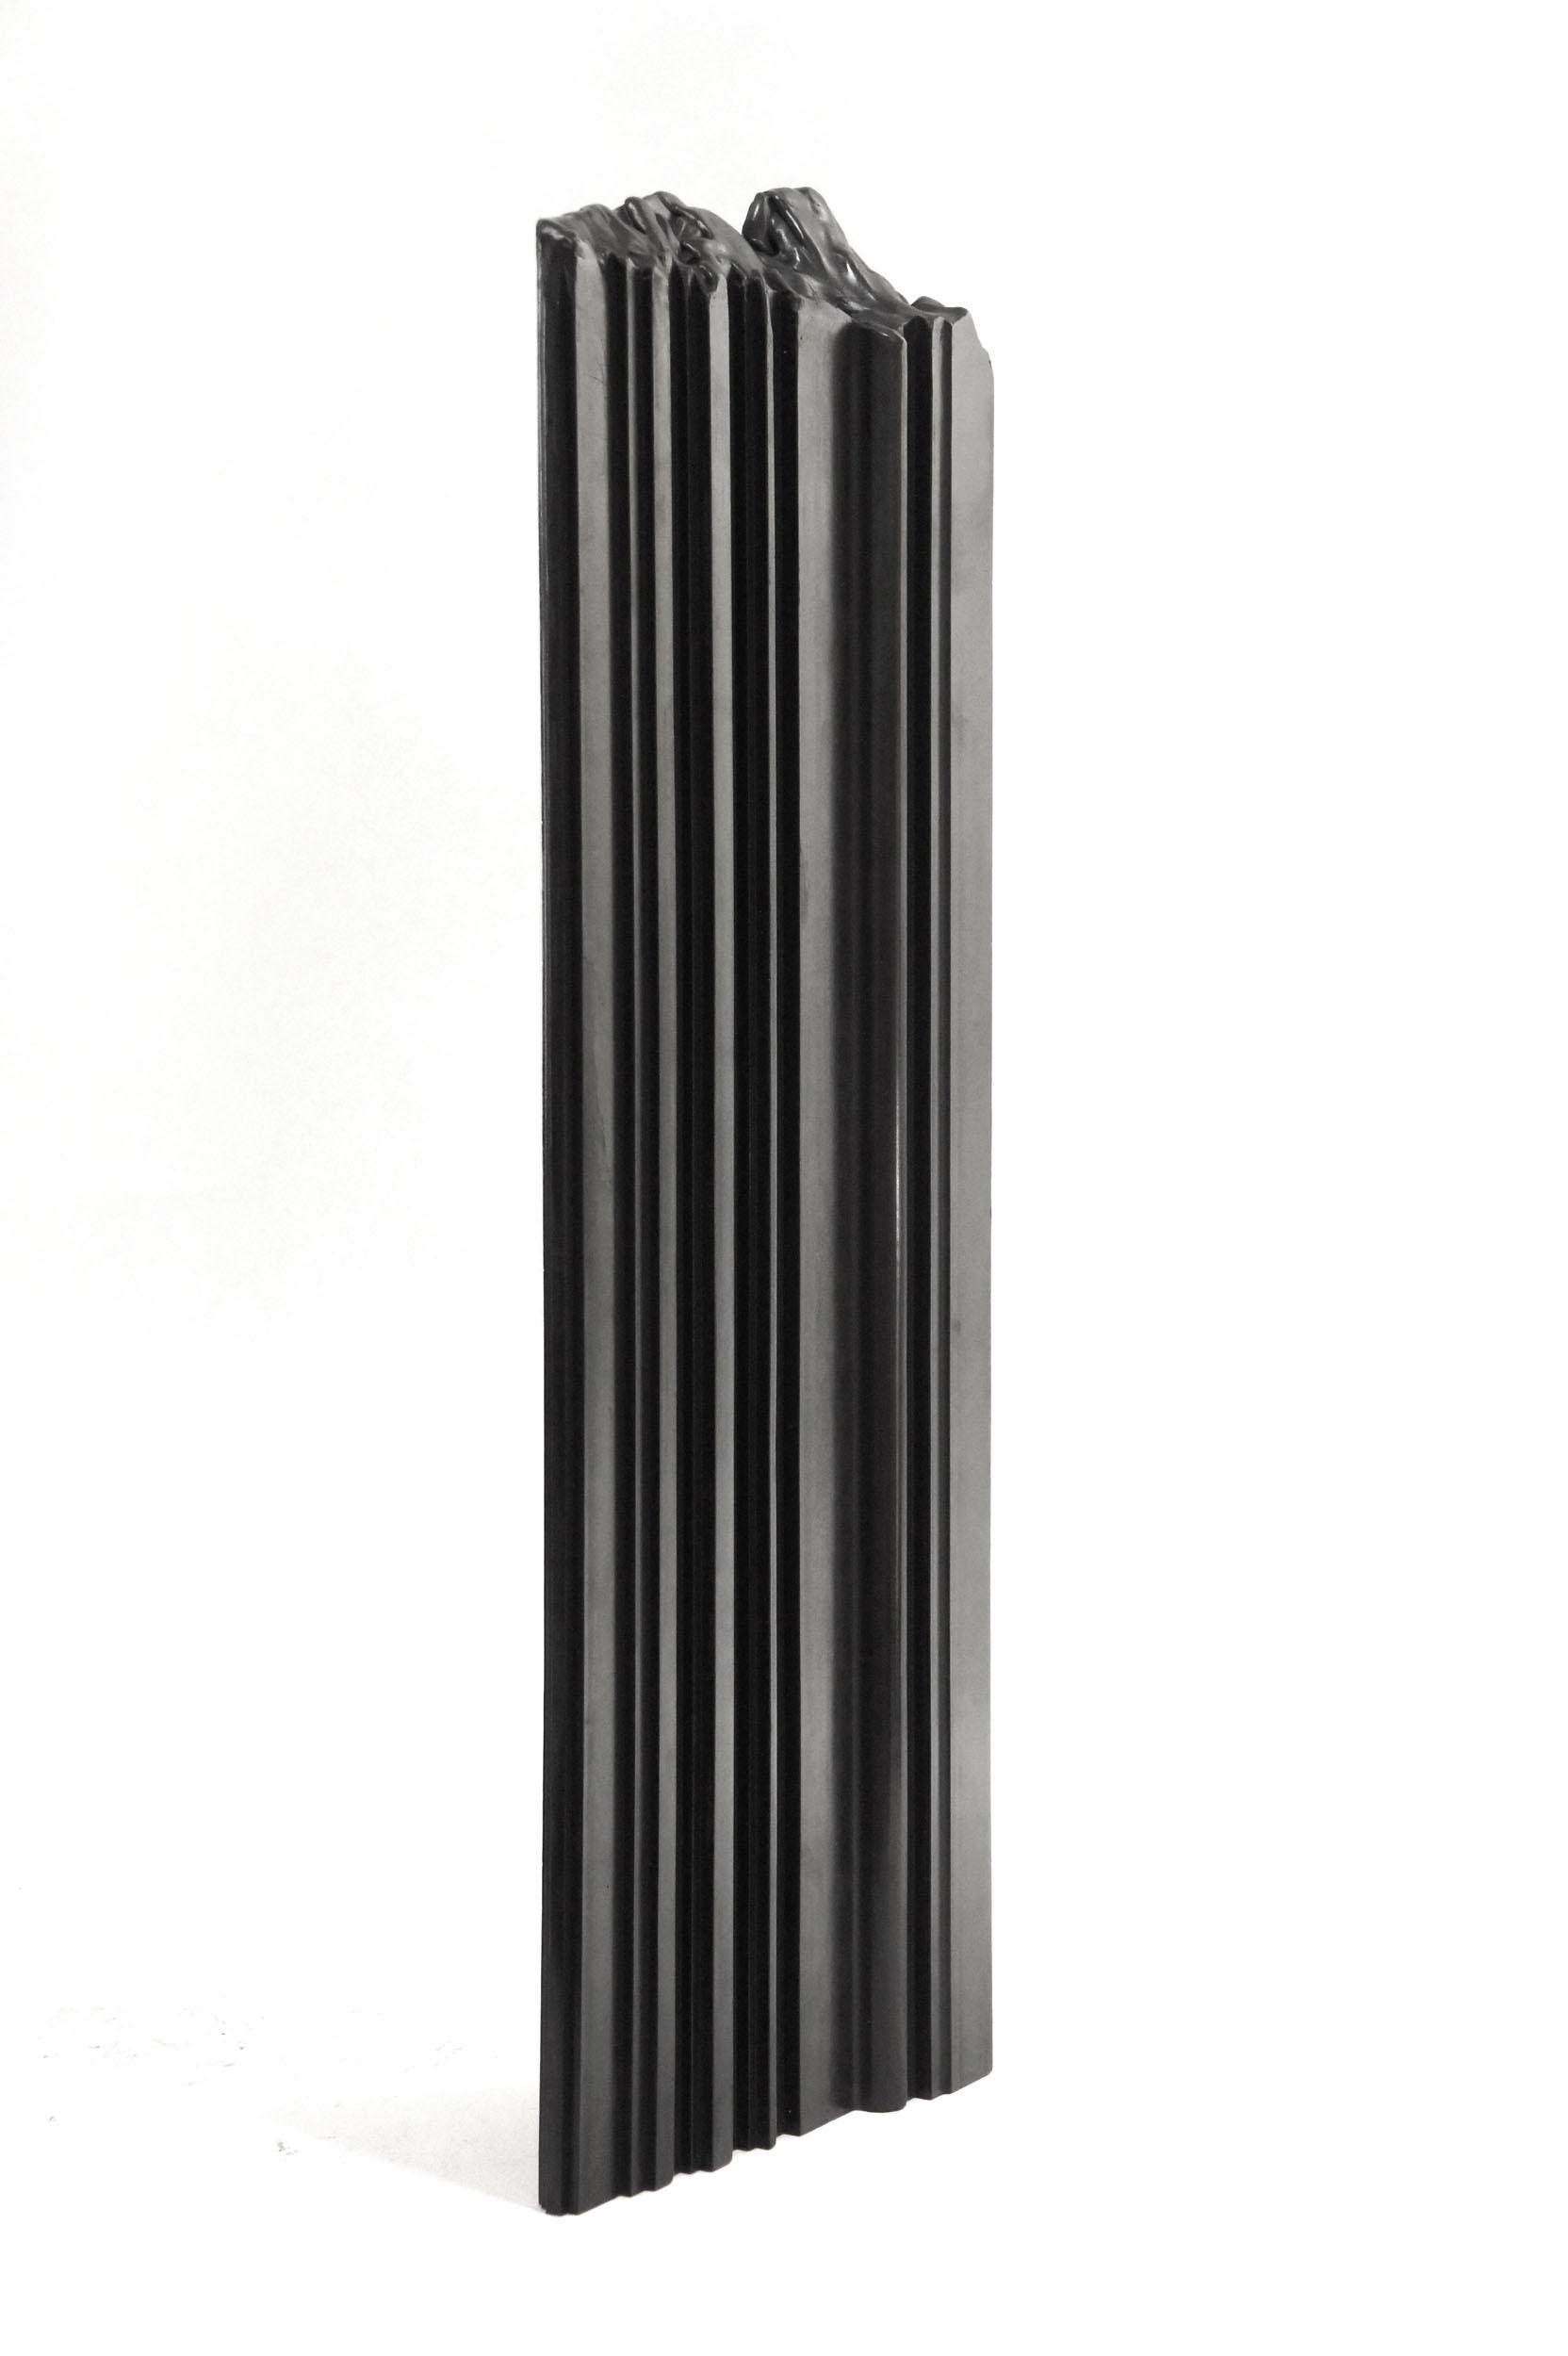 A black Bench Mould shelf stood on it's end showing ran edge